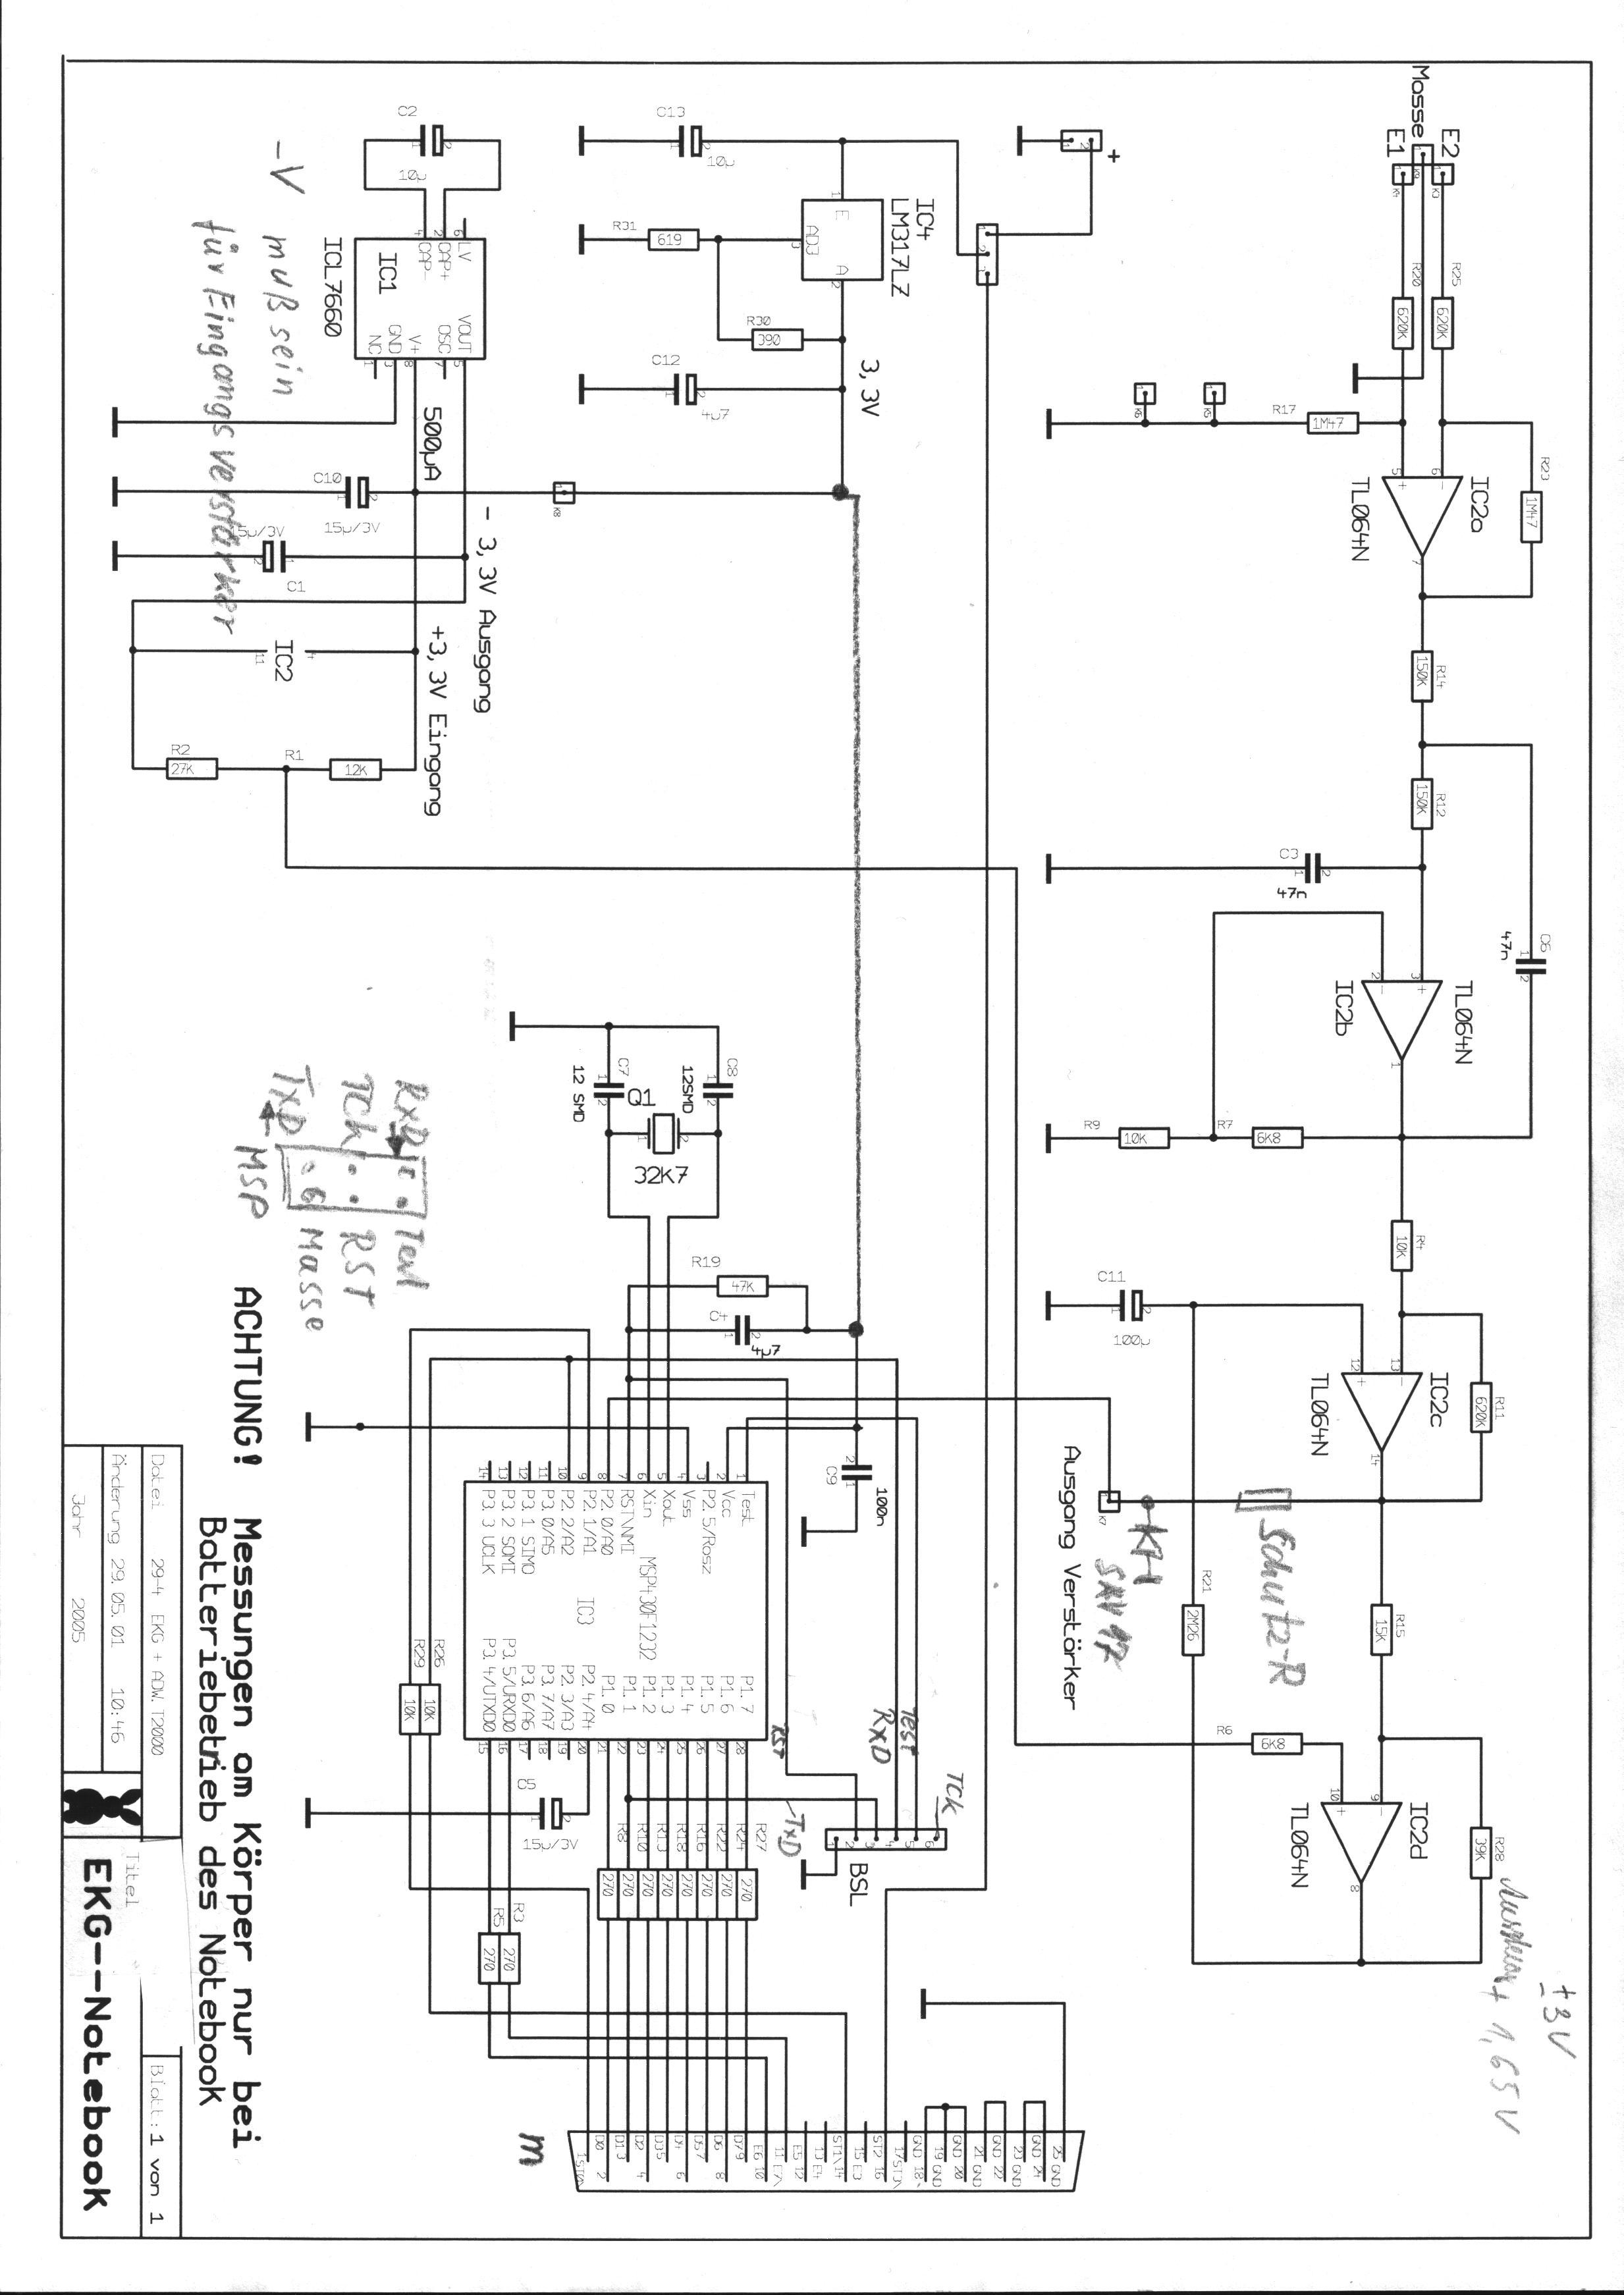 Berühmt Einwegschaltplan Ideen - Elektrische Schaltplan-Ideen ...